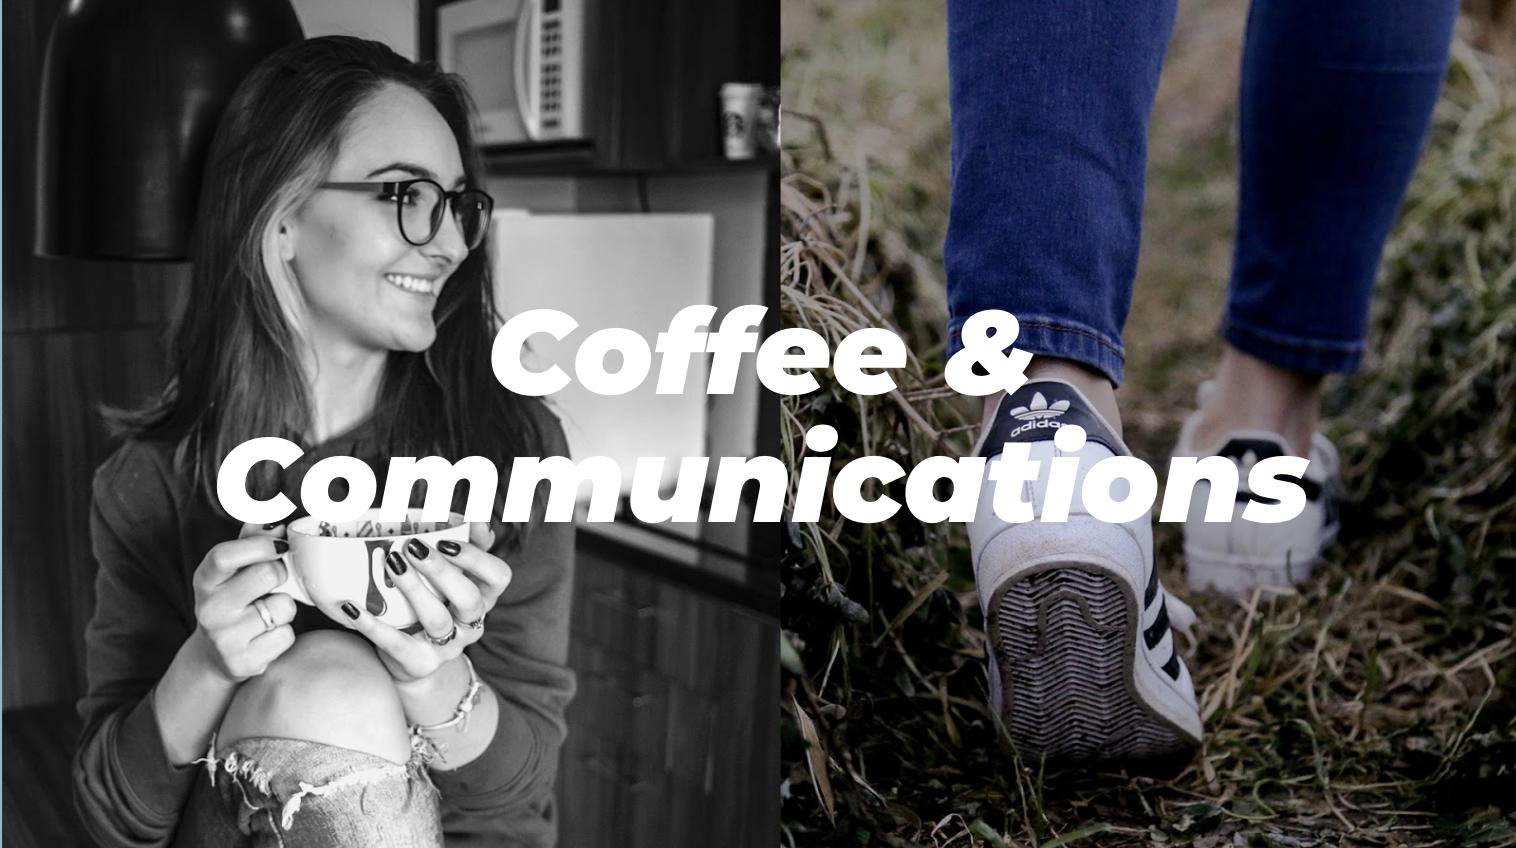 Coffee & Communications